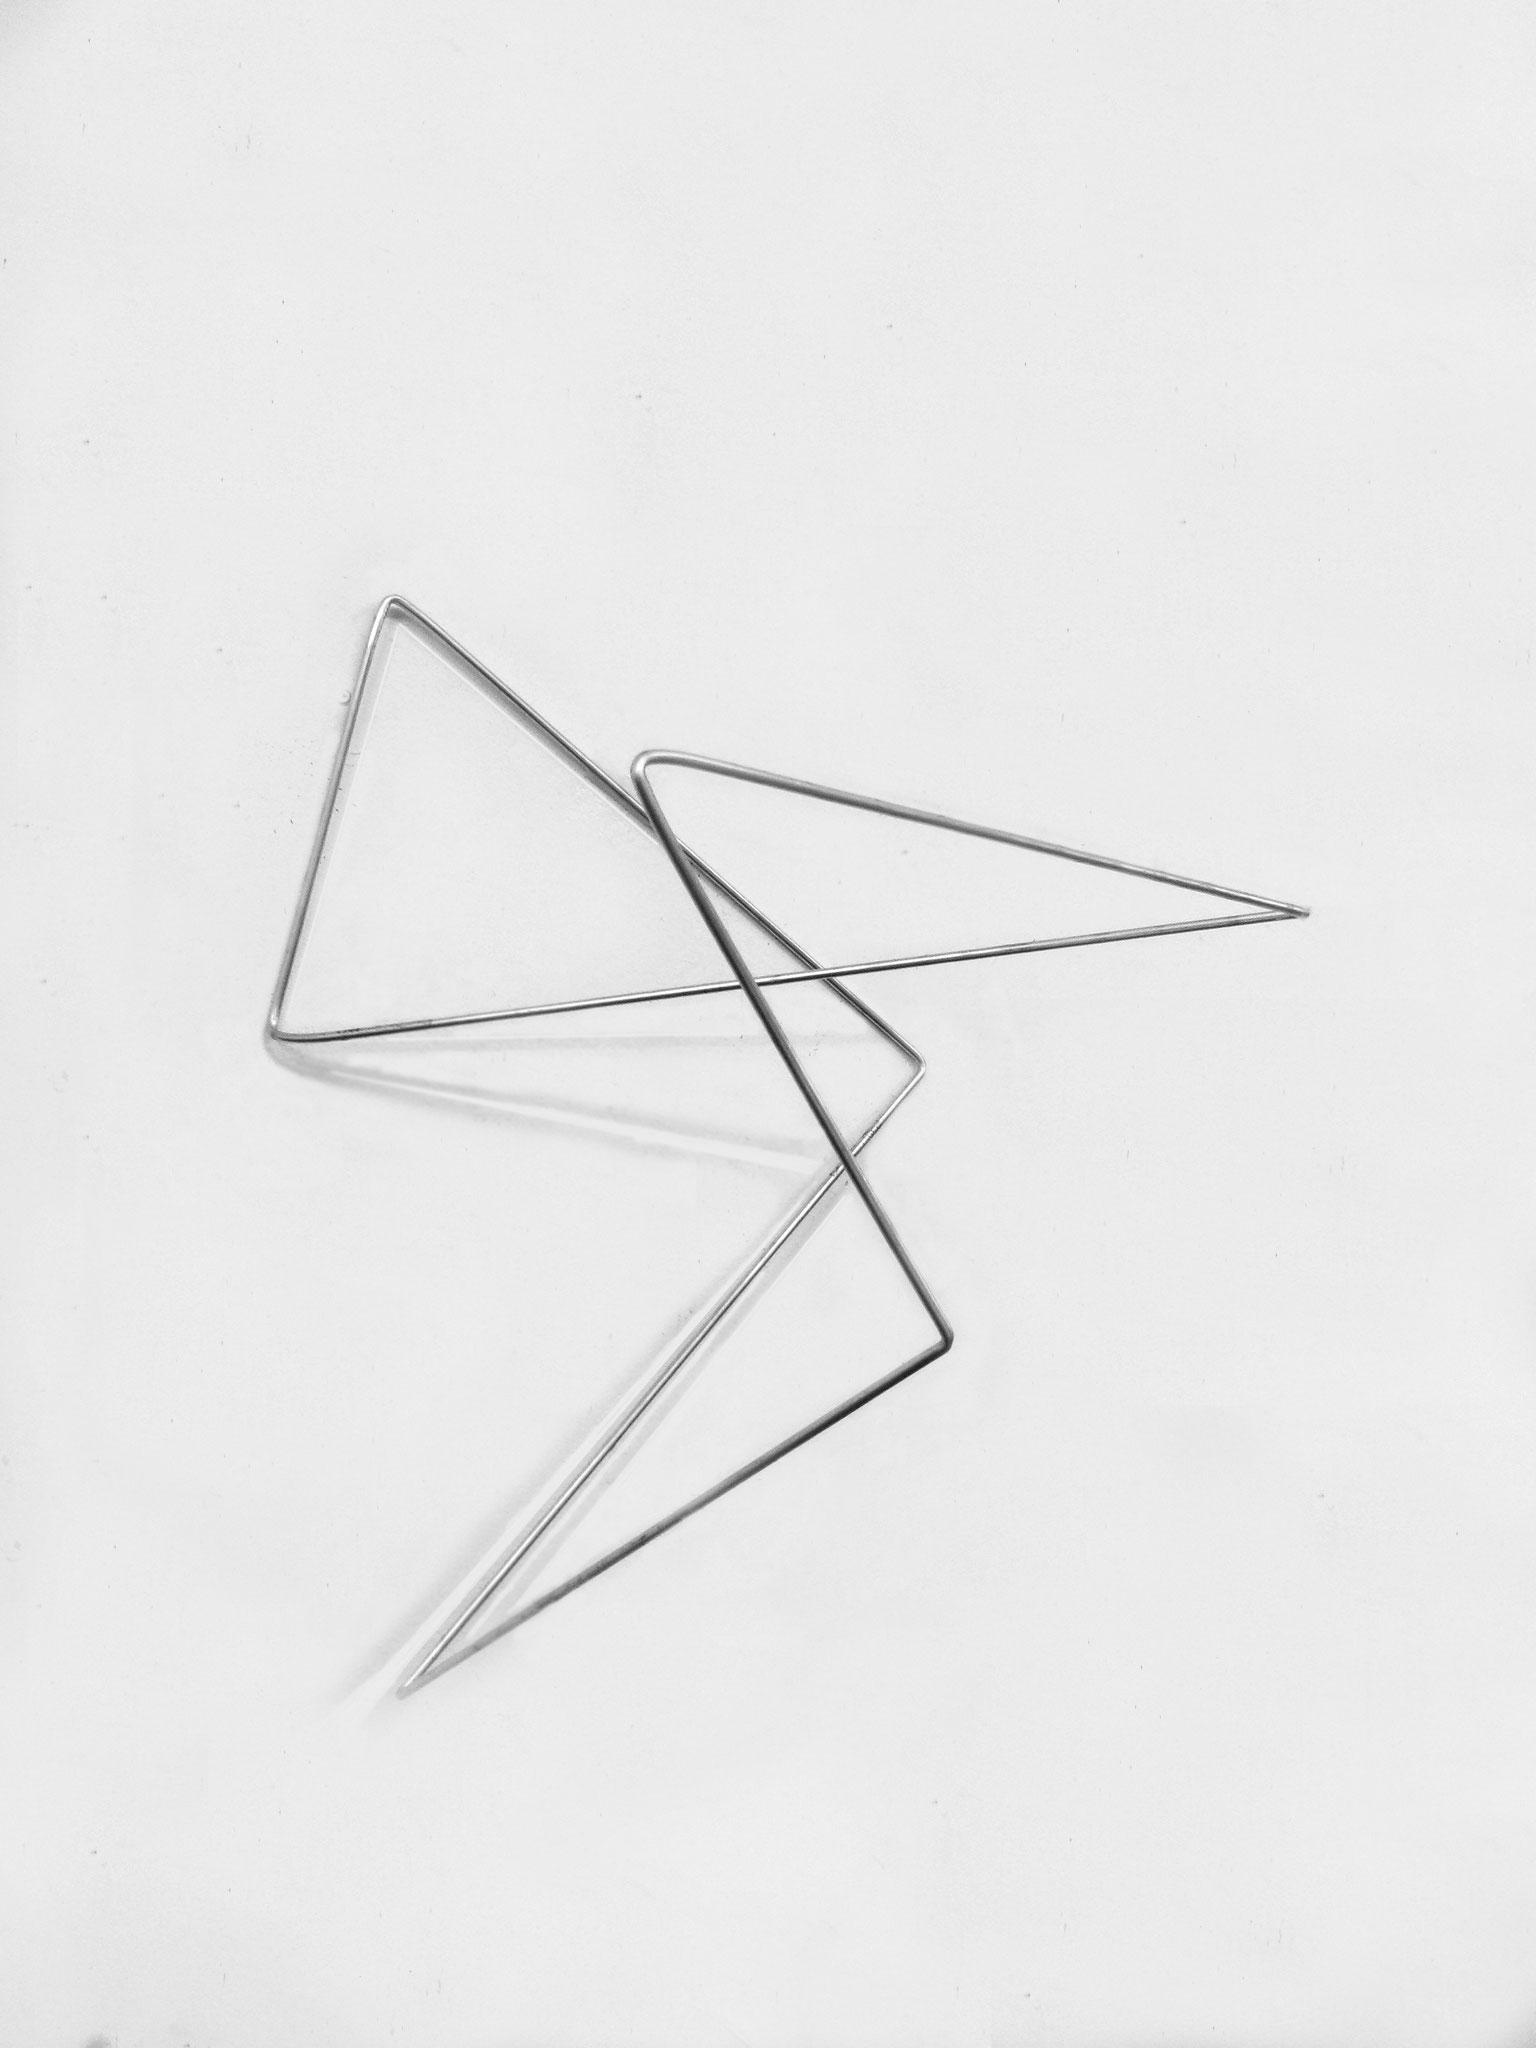 folded lines 04, 2019, Aluminiumstab, circa 65 x 60 x 45 cm